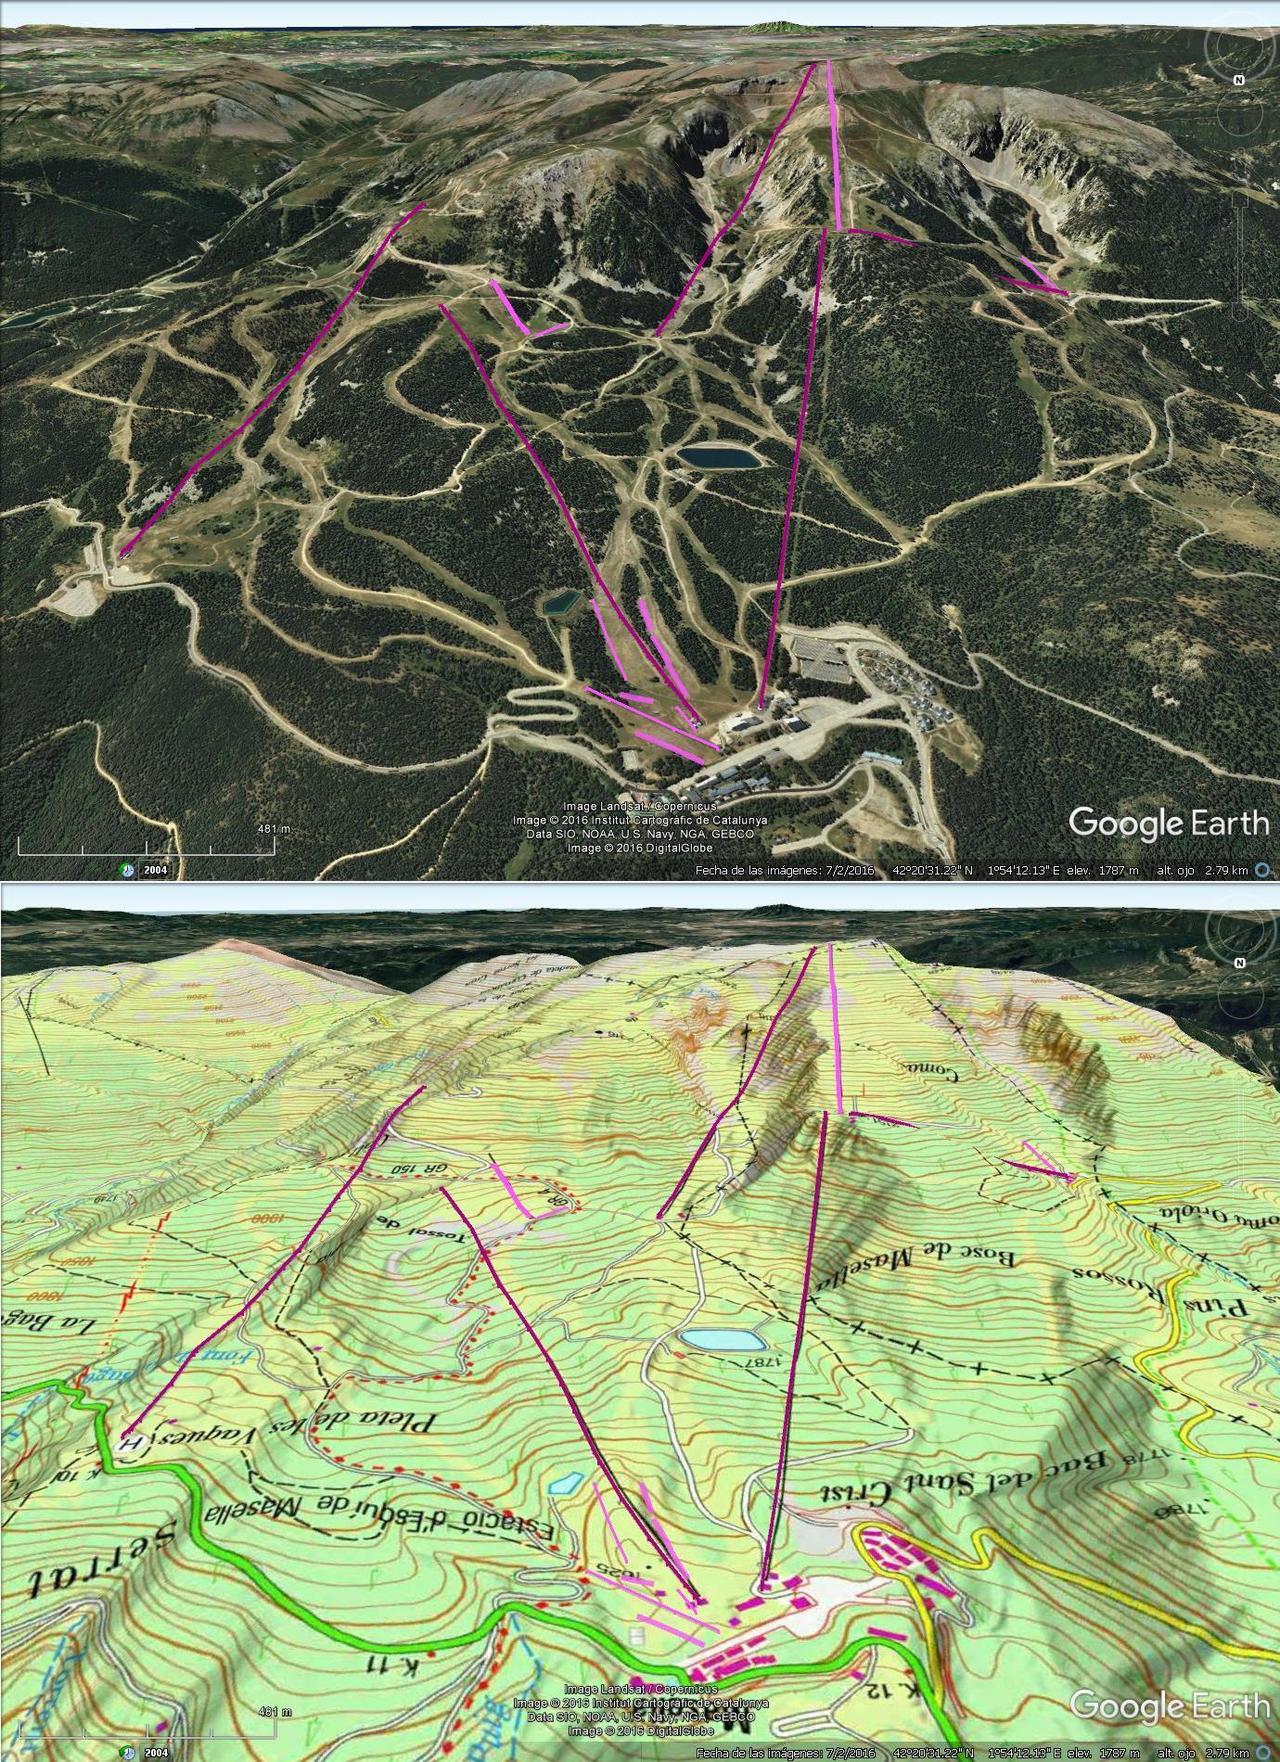 Vistas Google Earth Masella 2016-17